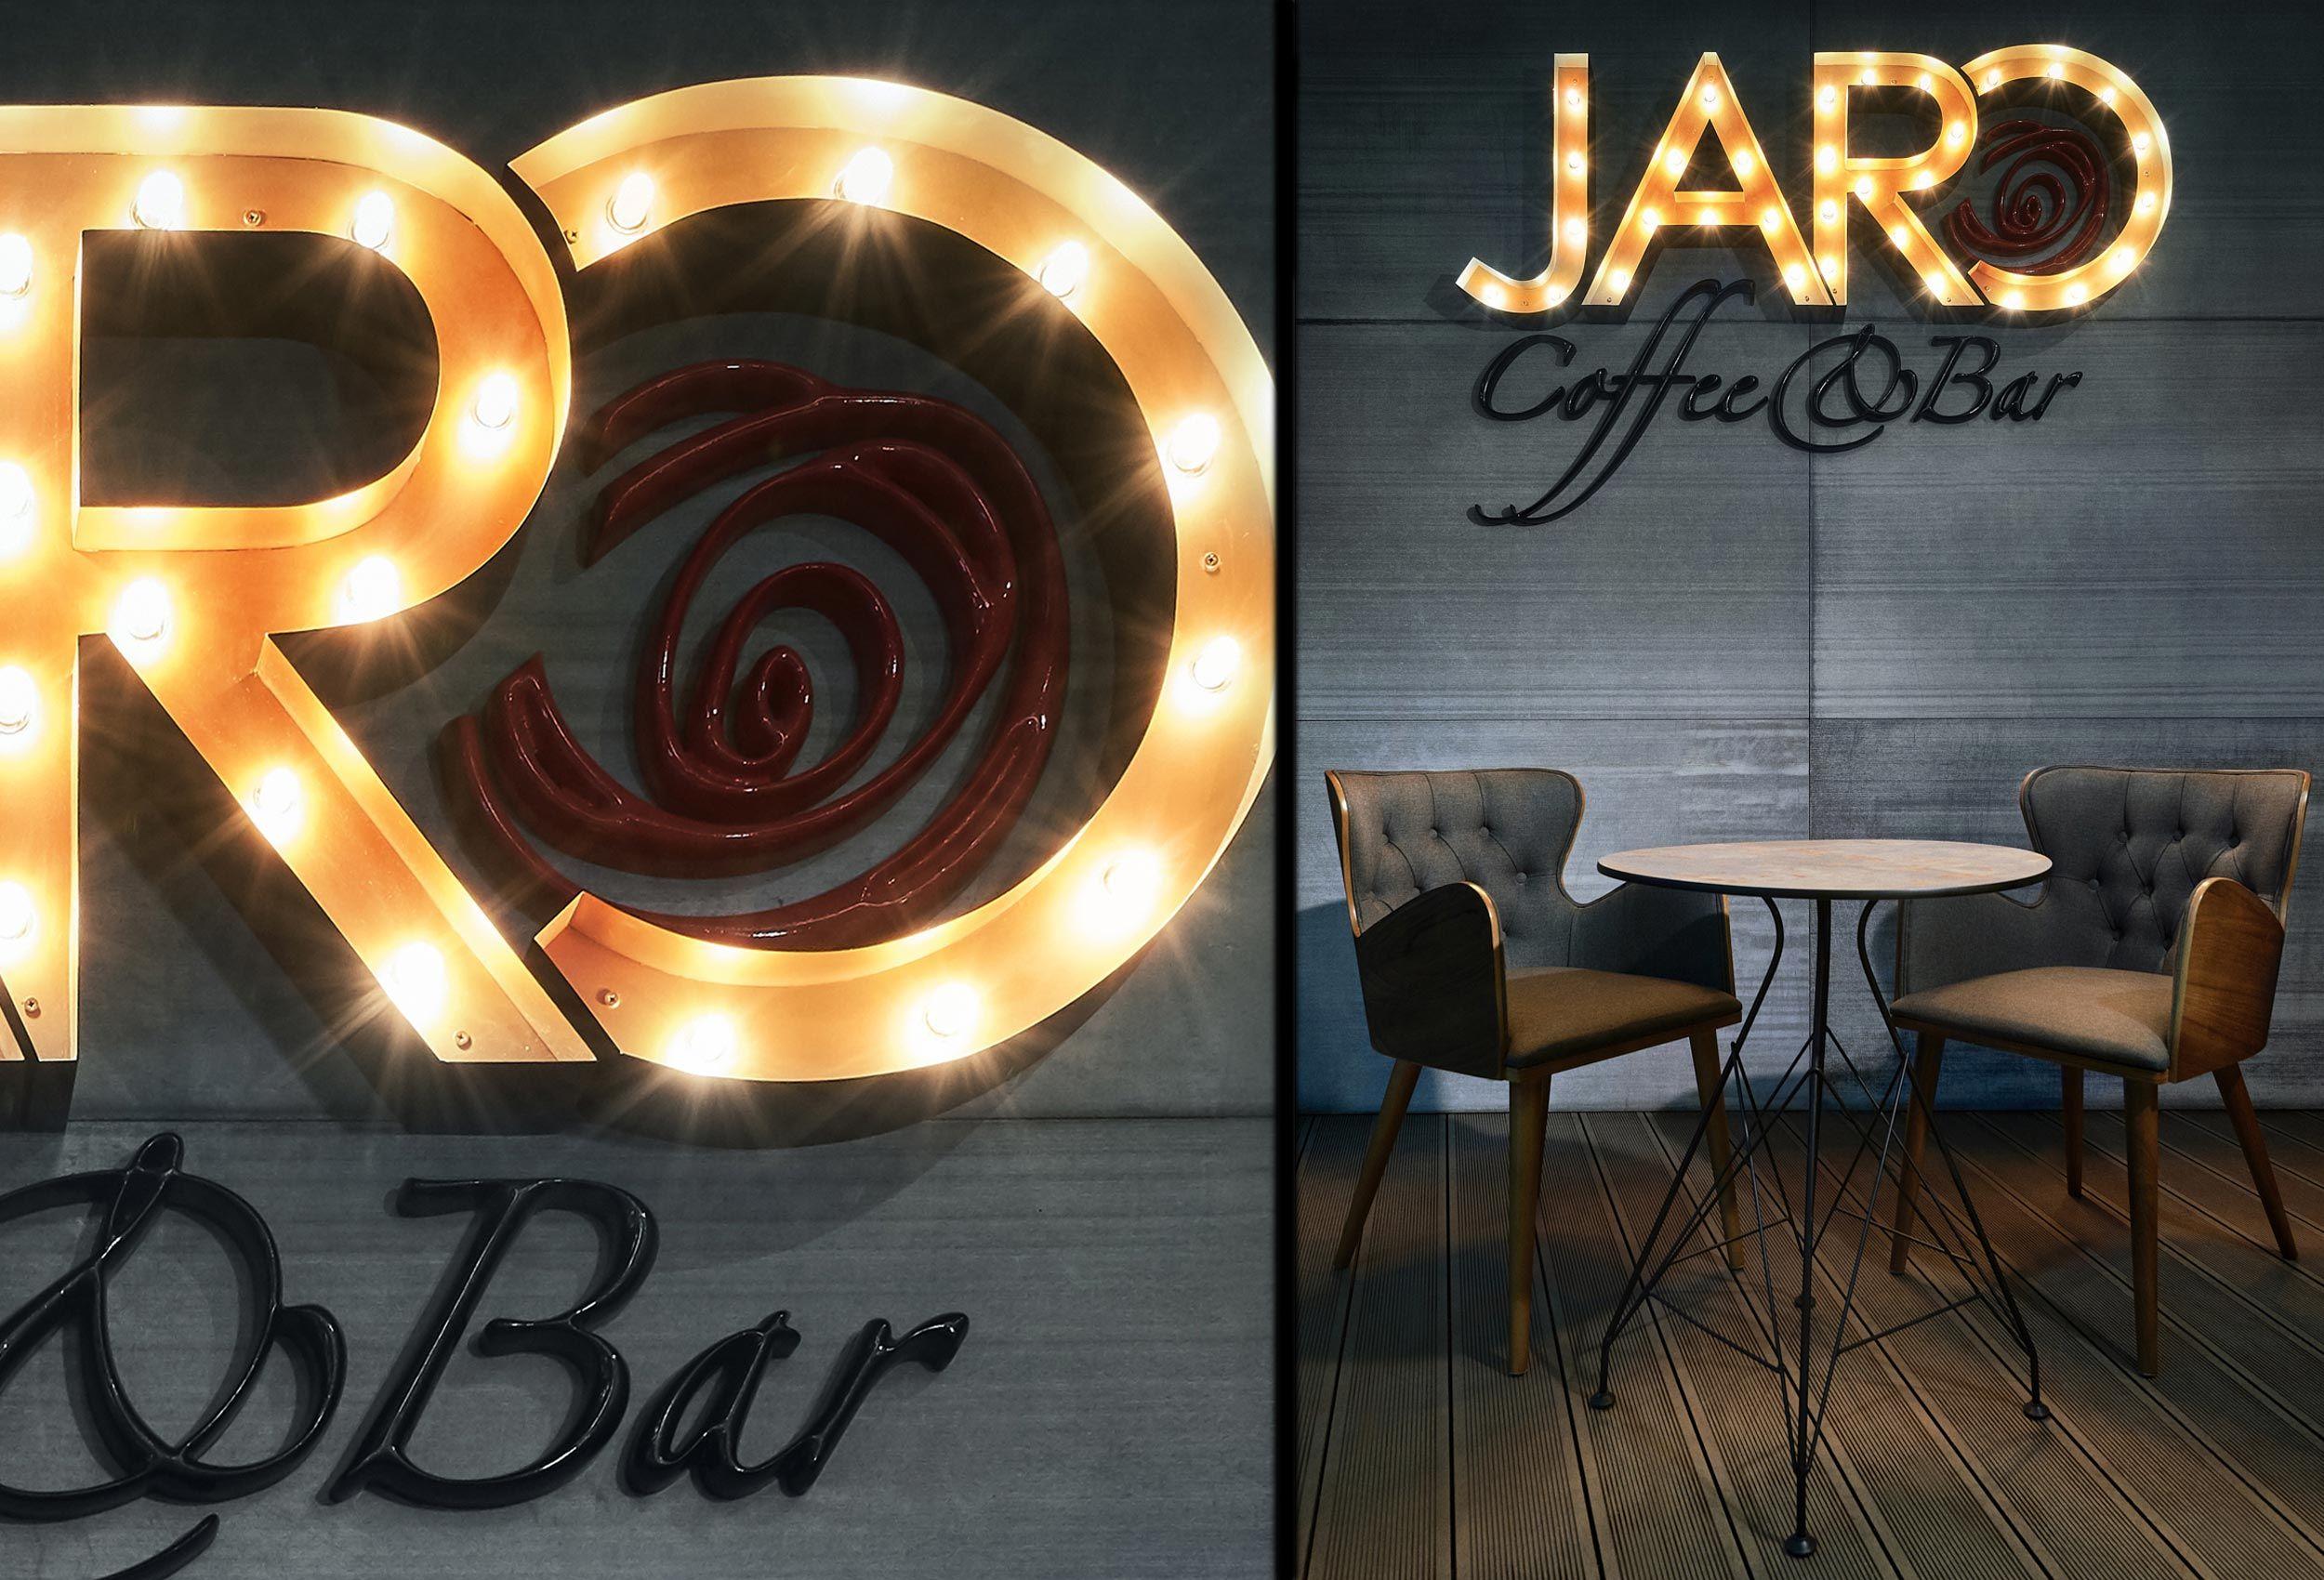 Interior Design of Jaro in Burgas from 2018